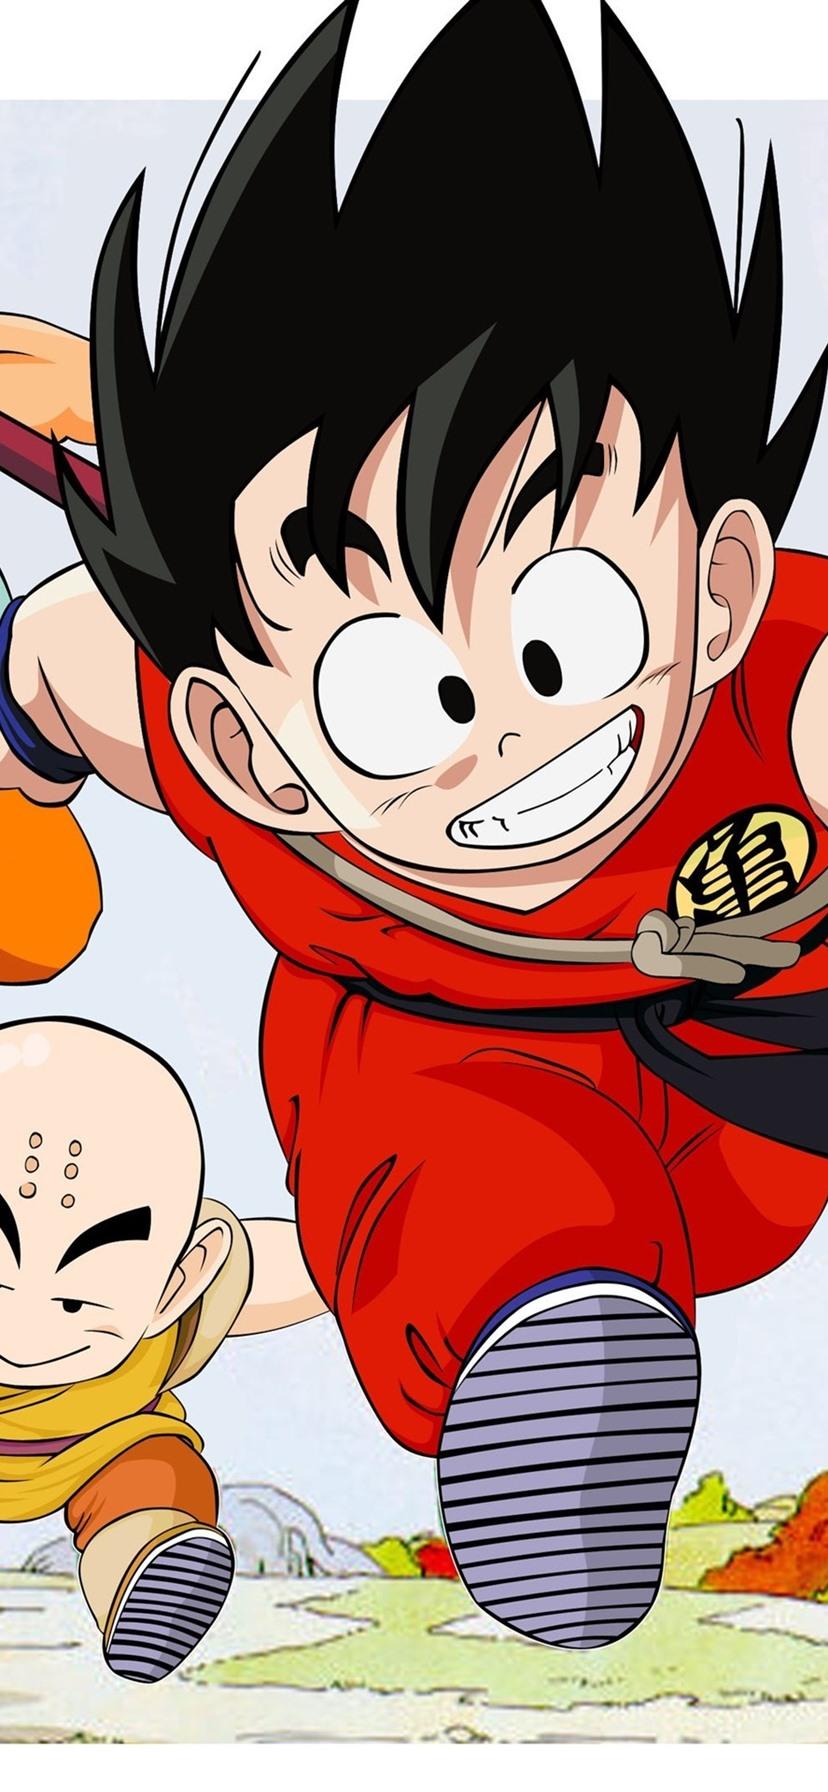 50 Dragon Ball Iphone Wallpapers Download At Wallpaperbro